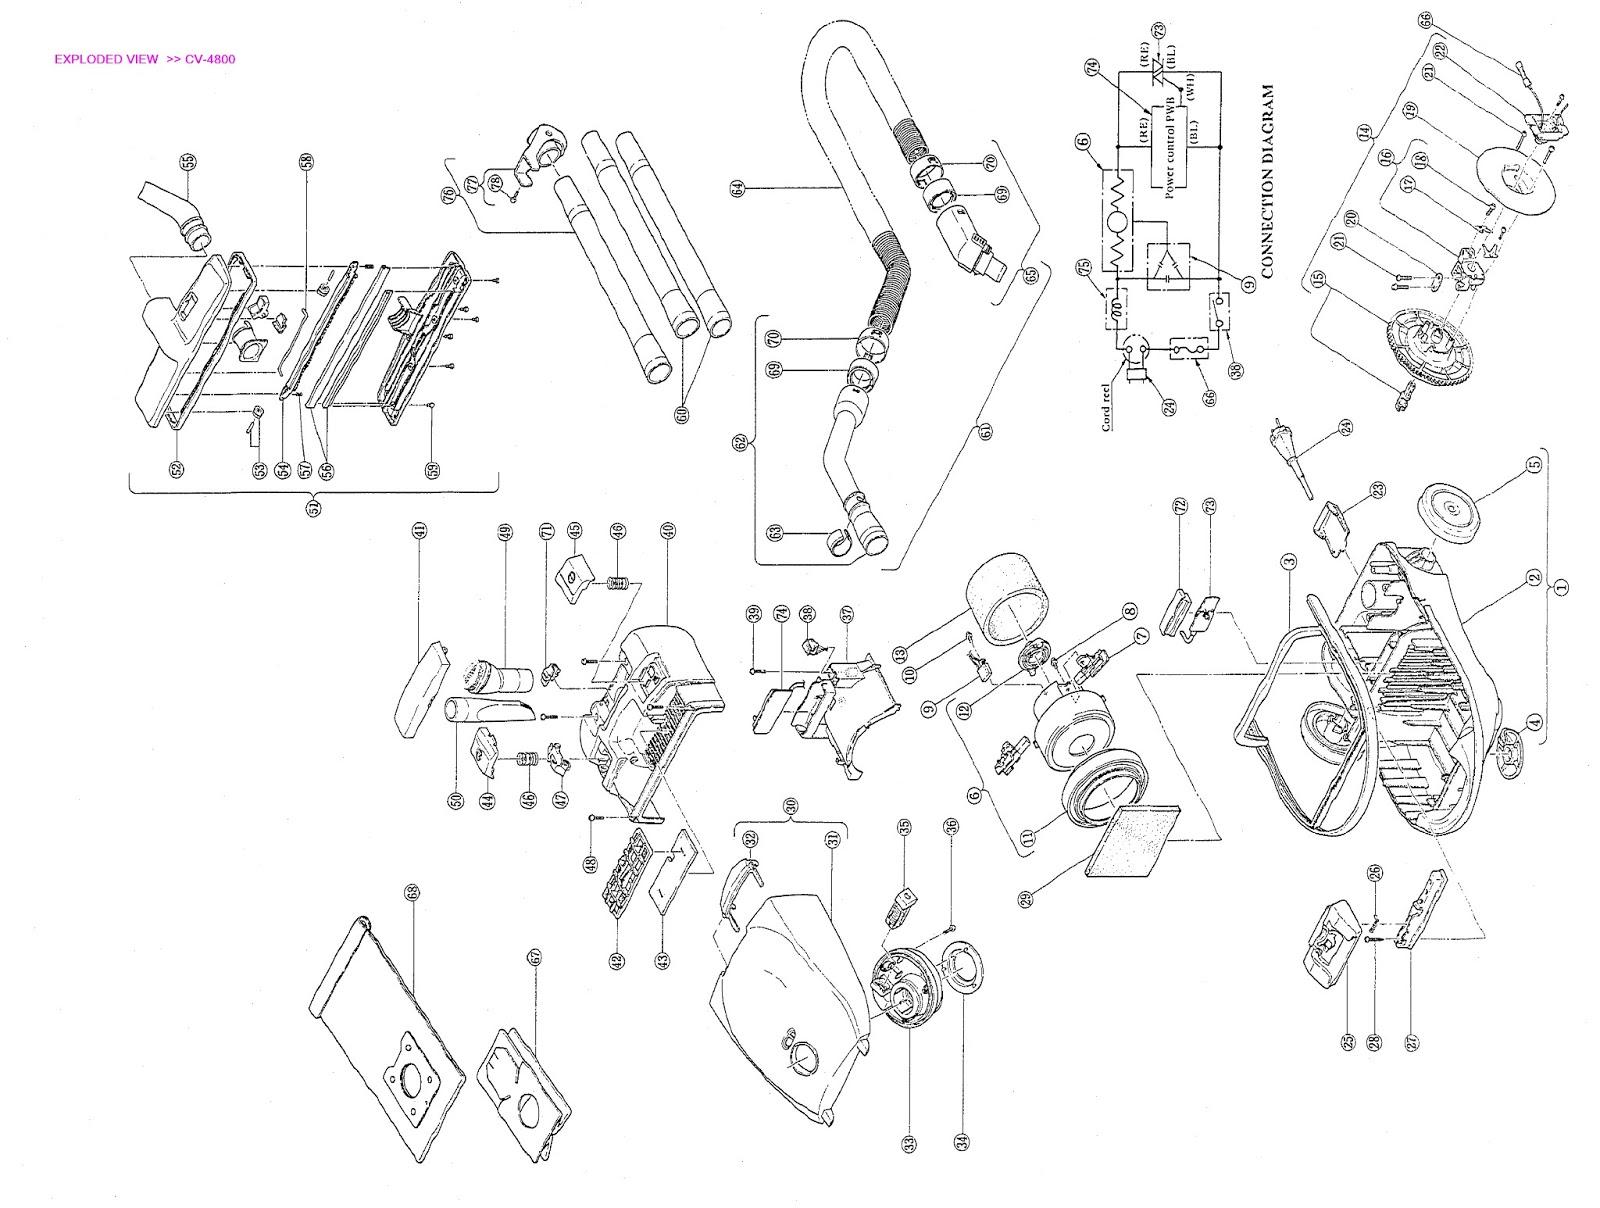 04 audi a4 vacuum diagram html